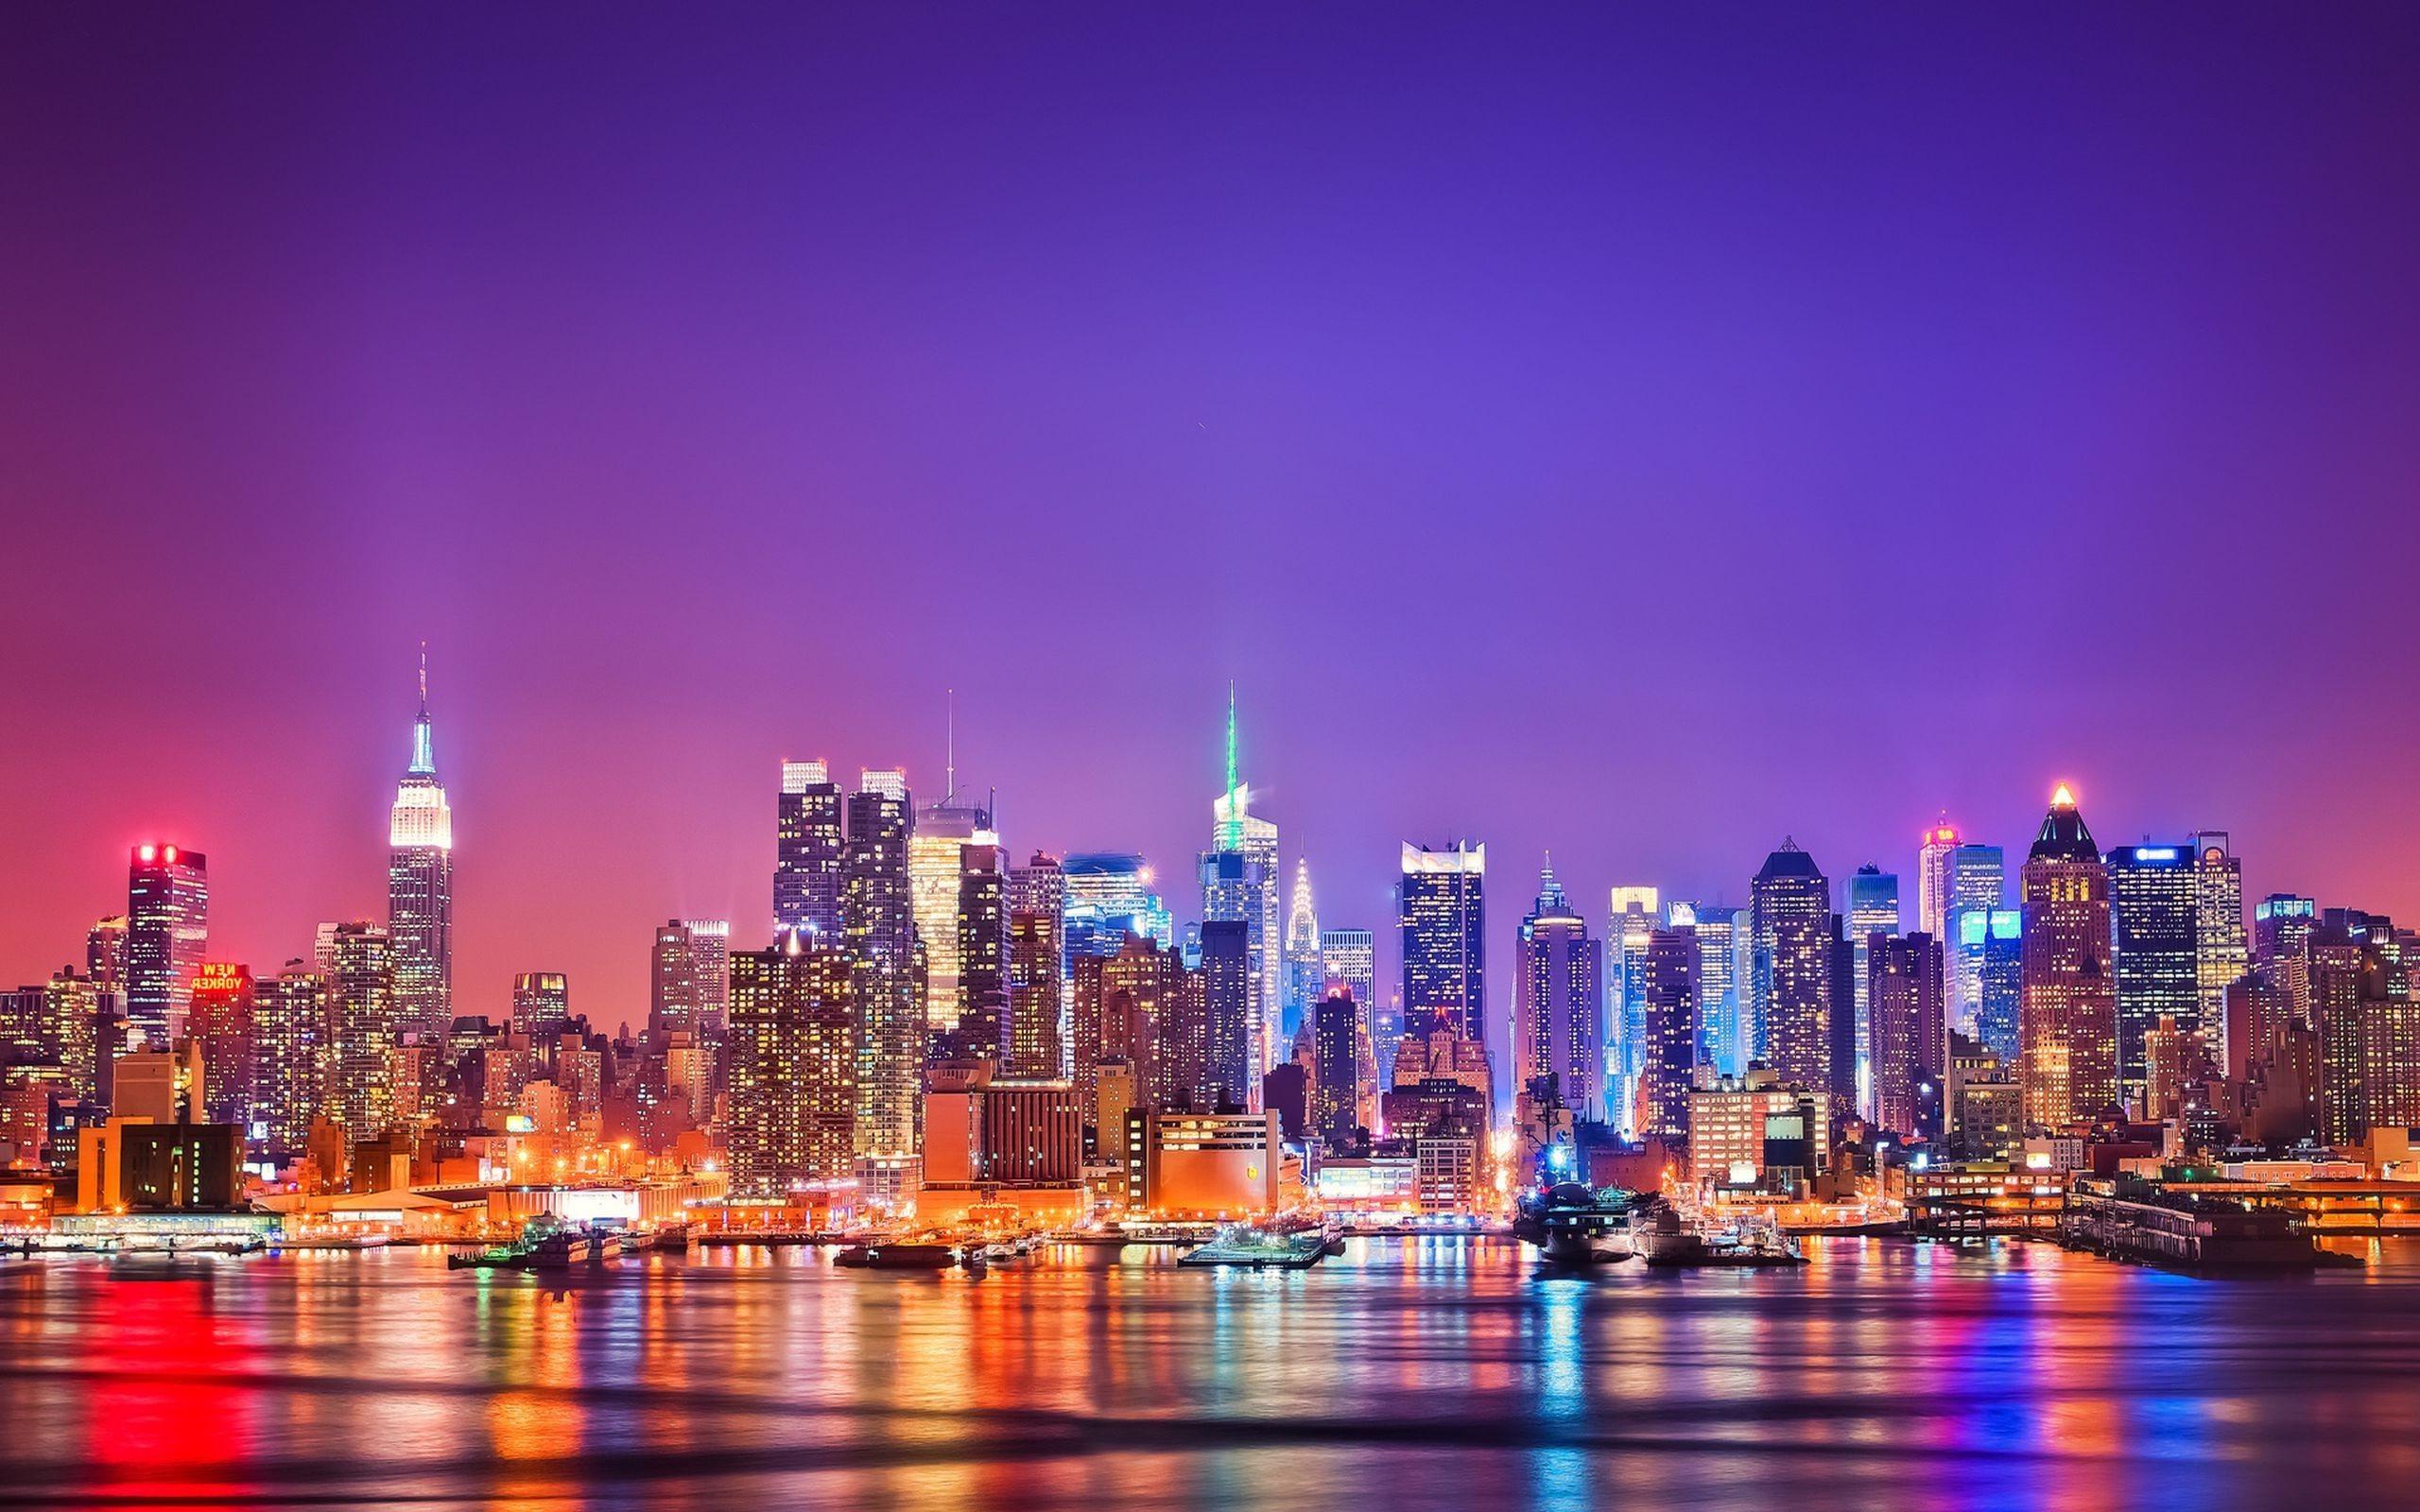 City Light at Night Wallpaper in High Resolution at City Wallpaper 2560x1600